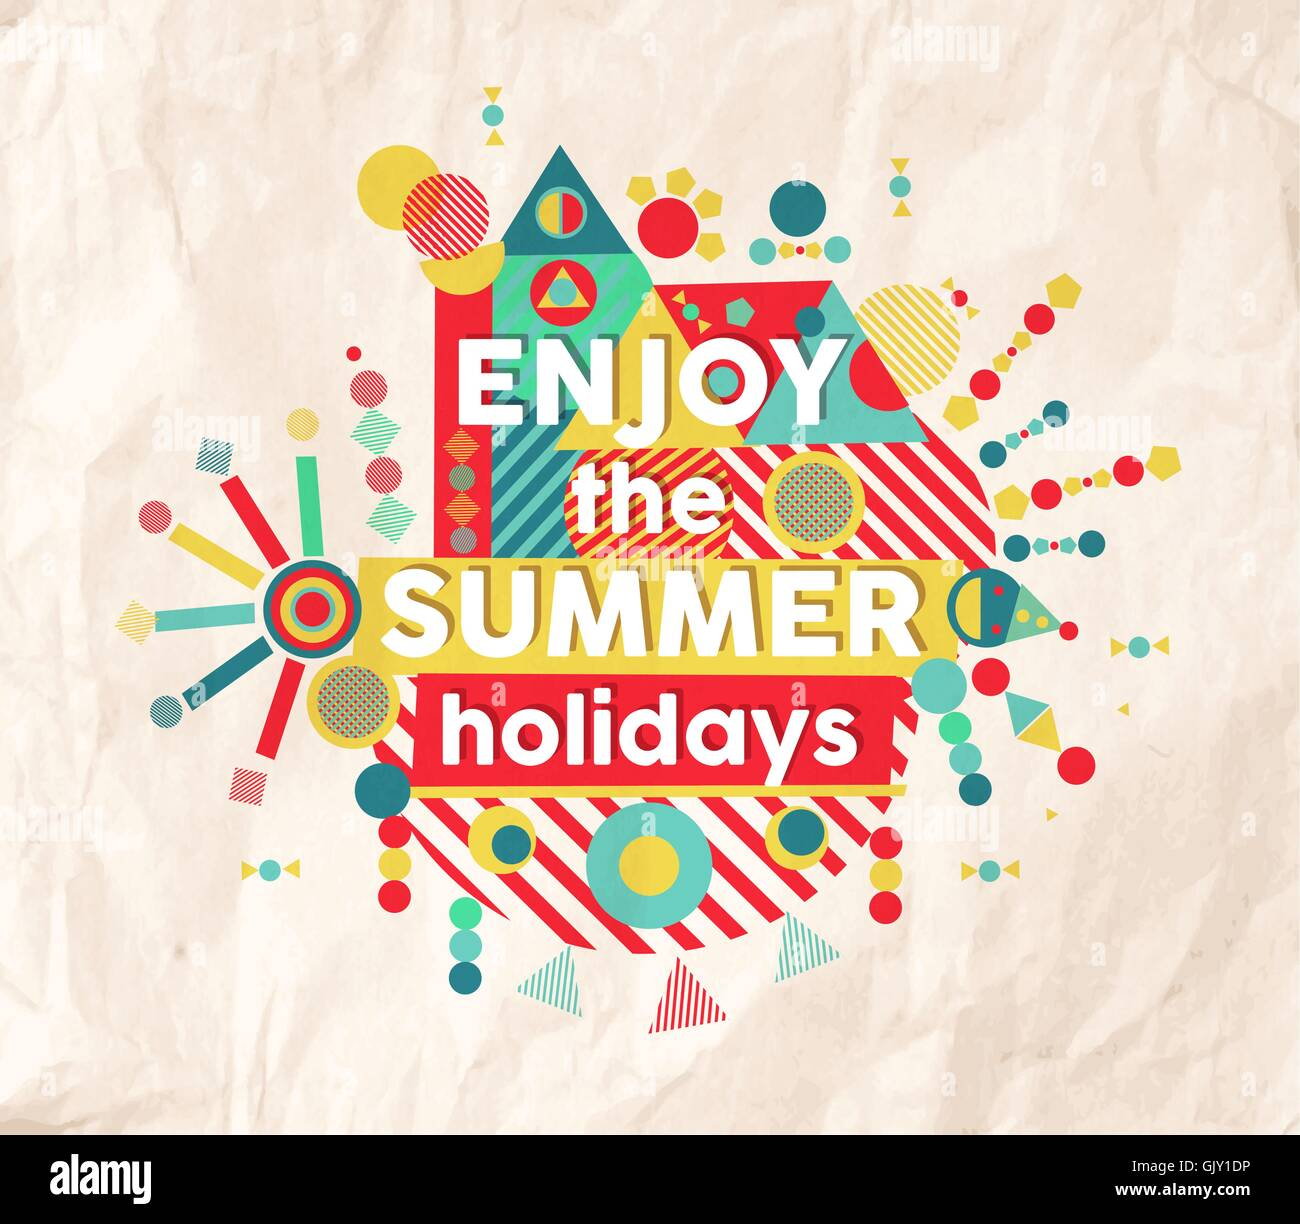 Poster design keywords - Enjoy Summer Fun Quote Poster Design